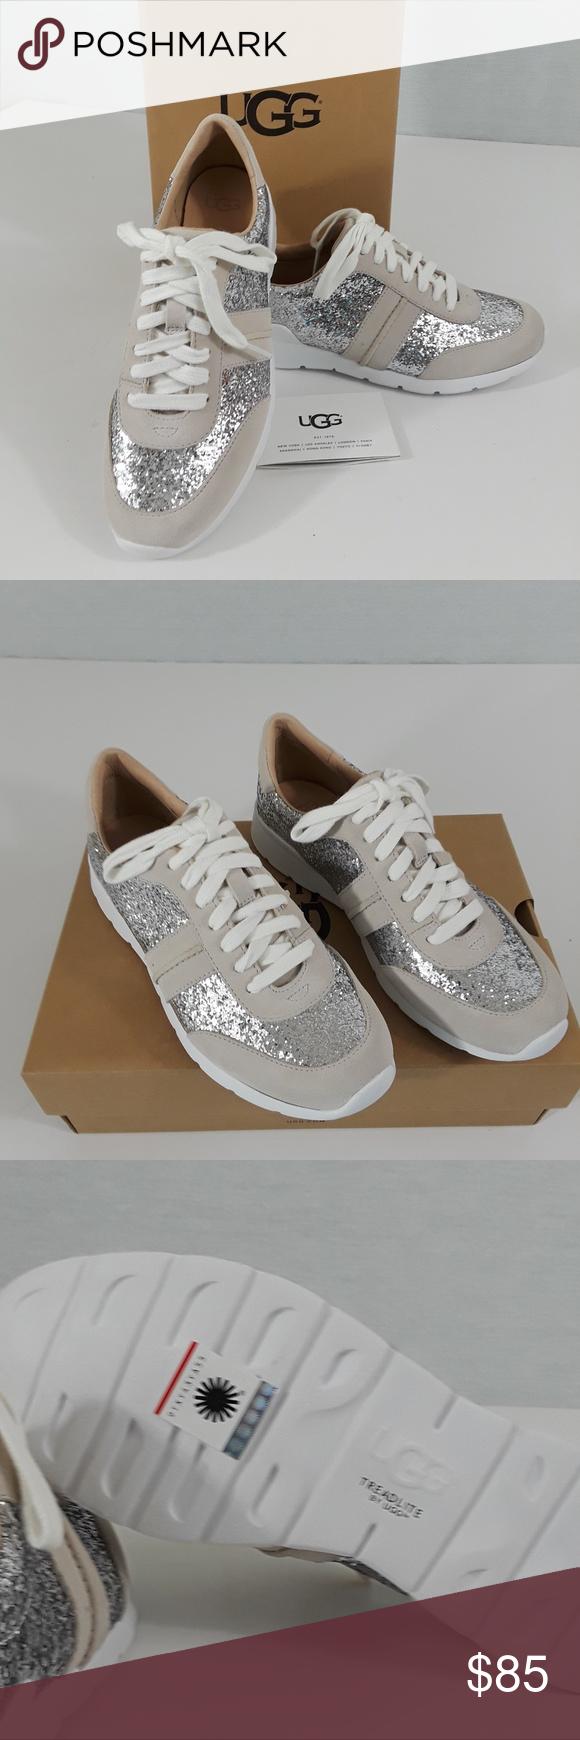 a369eb2e884 UGG Jaida Glitter Suede Sneaker - sz 6 NIB Lightweight sneaker with ...